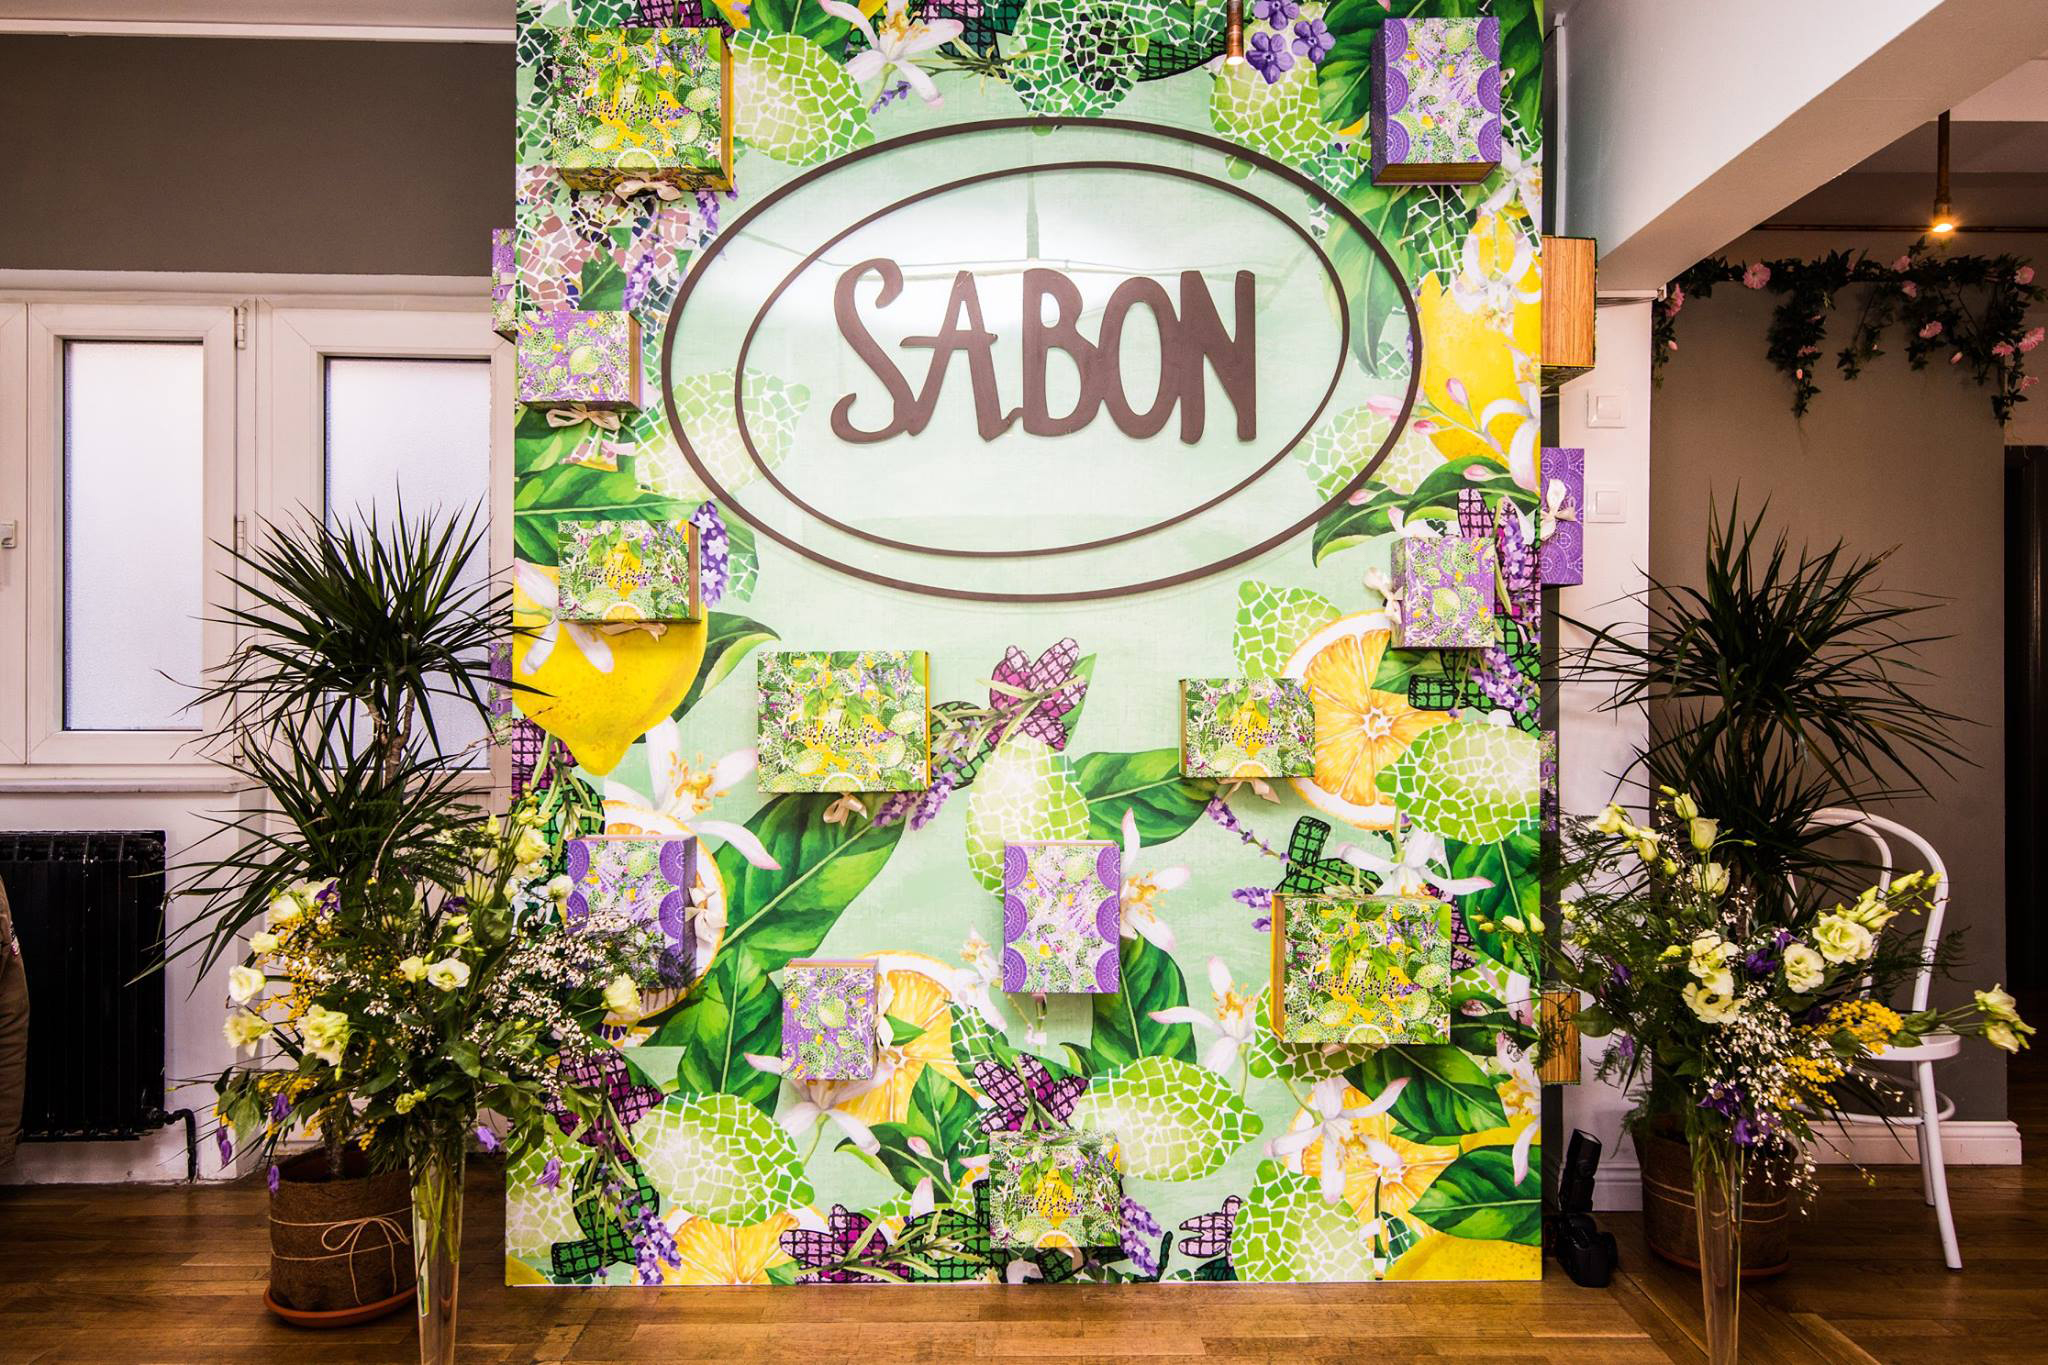 Sabon Set Up Booth